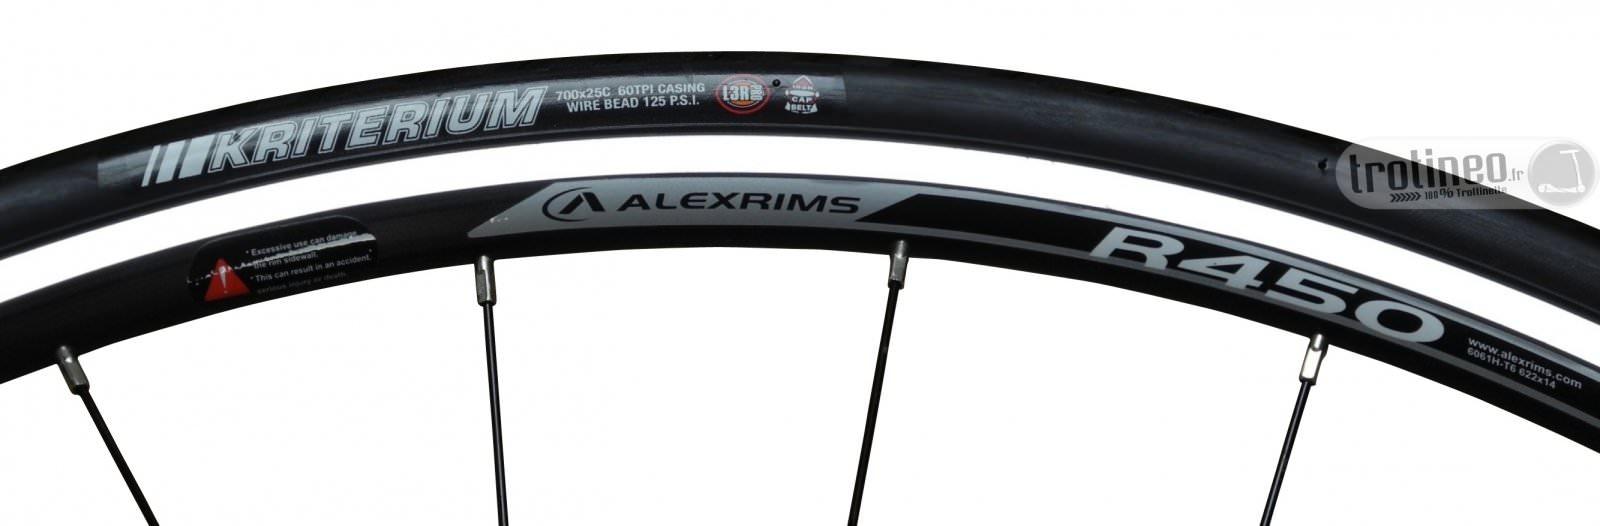 kickbike-roue complète Av RaceMax 700 2